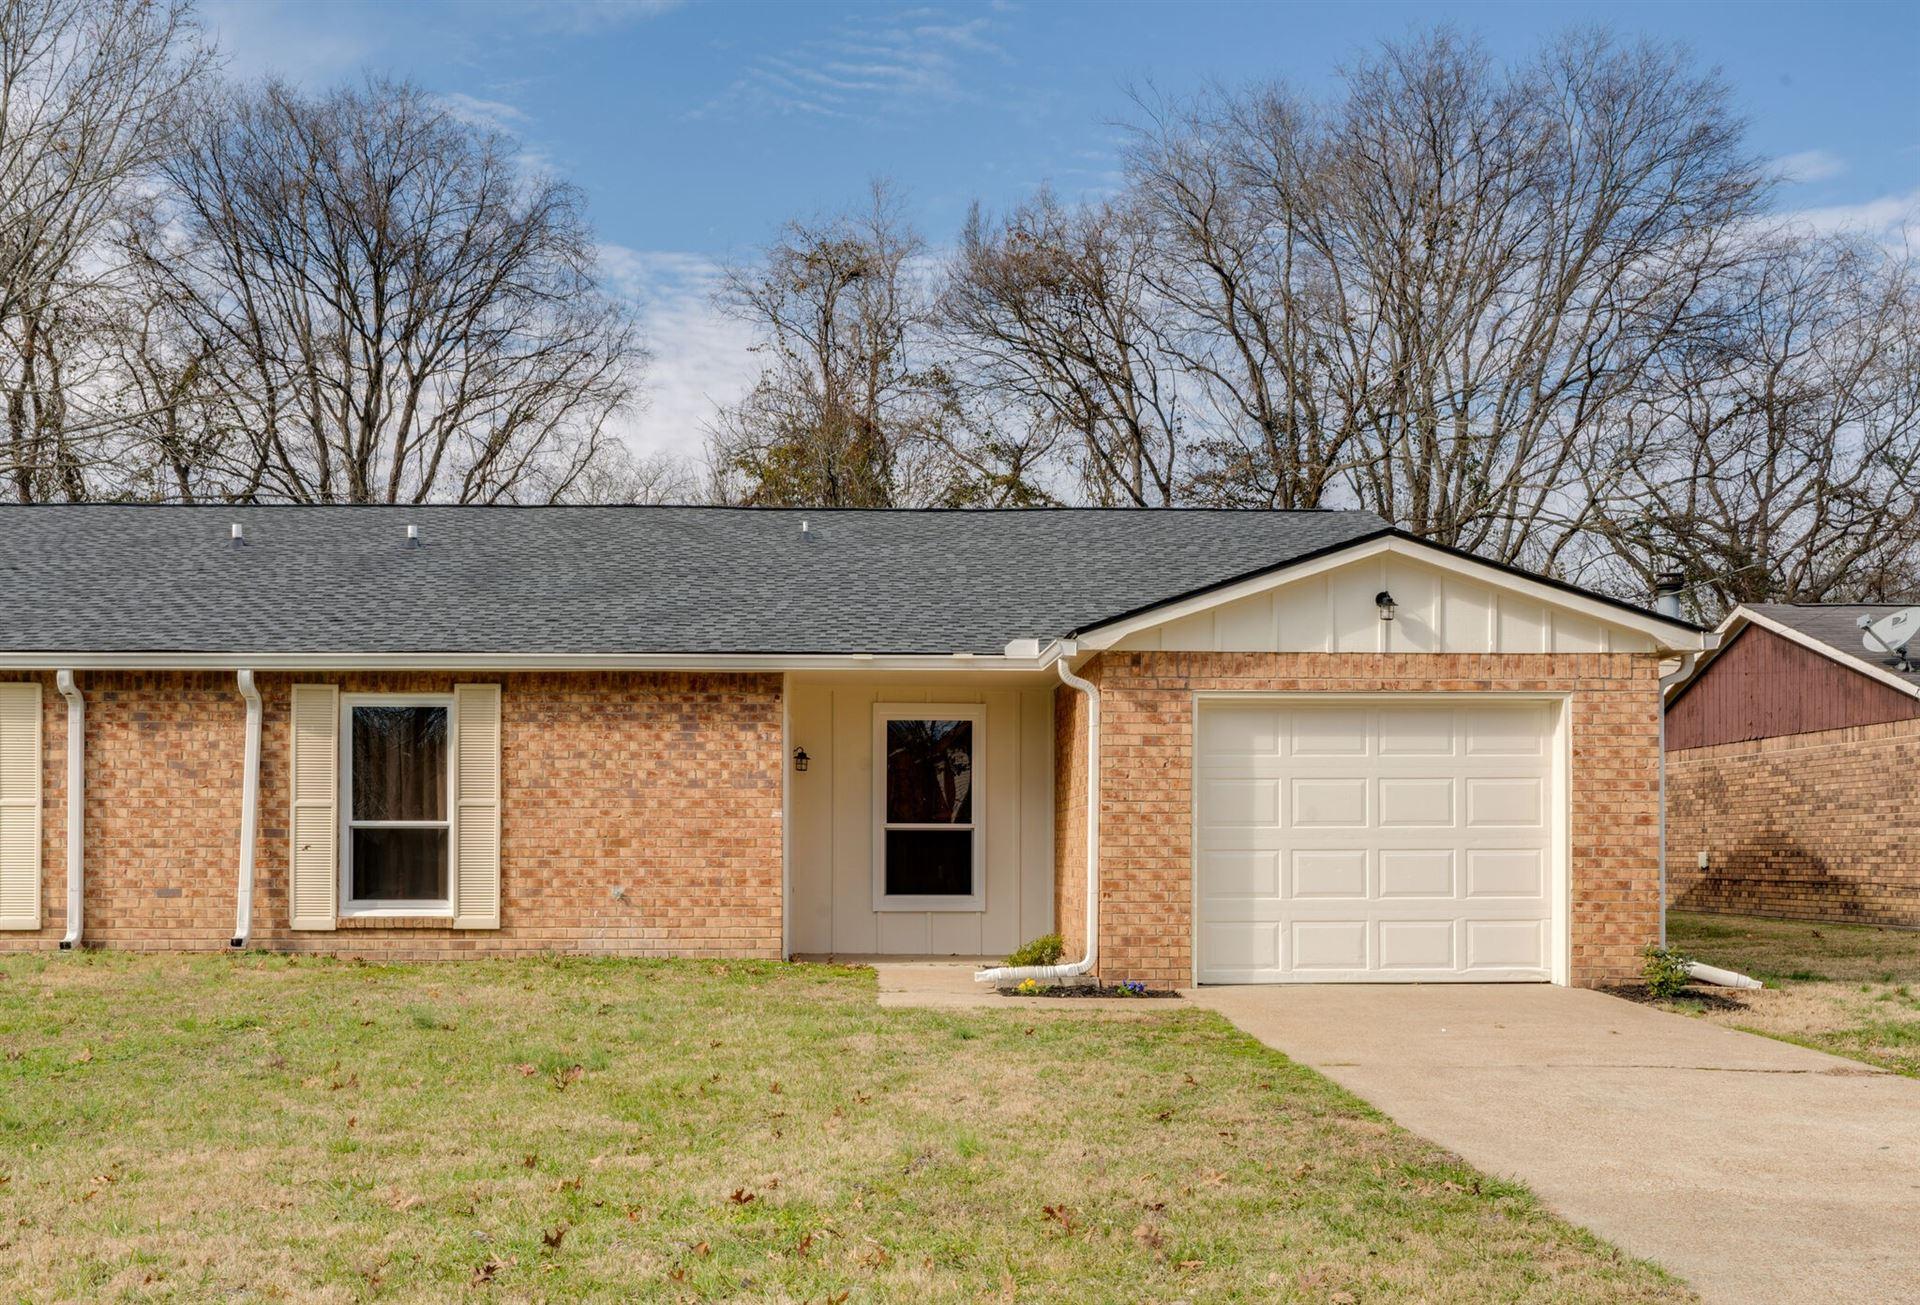 1430 E Cedar Ln, Madison, TN 37115 - MLS#: 2219126